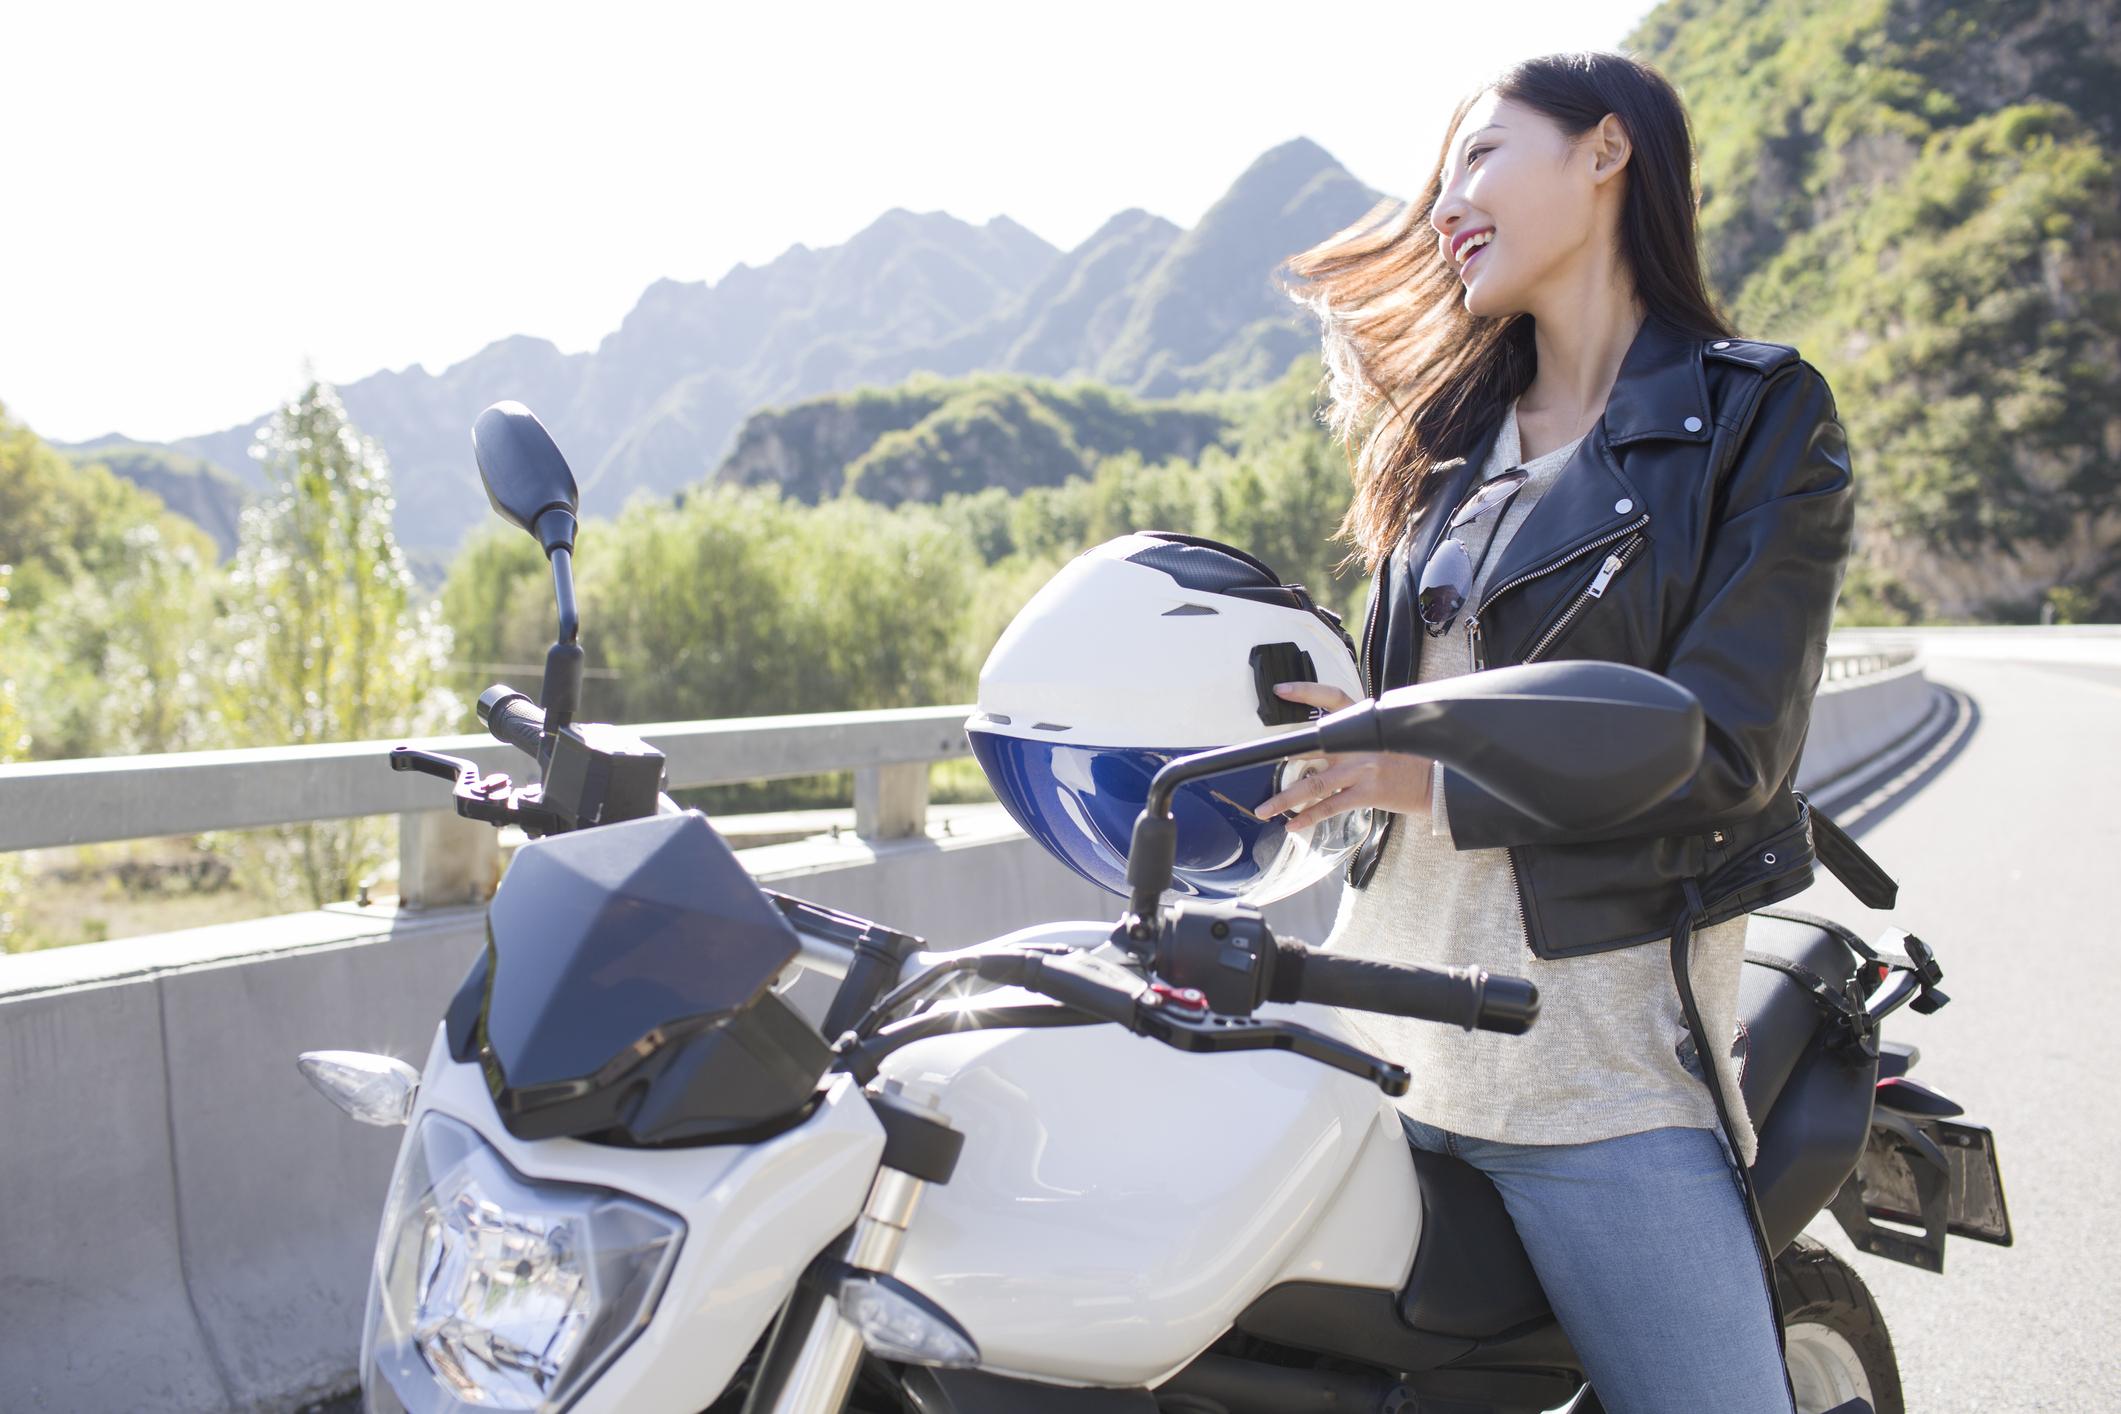 Motorrad frauen kennenlernen